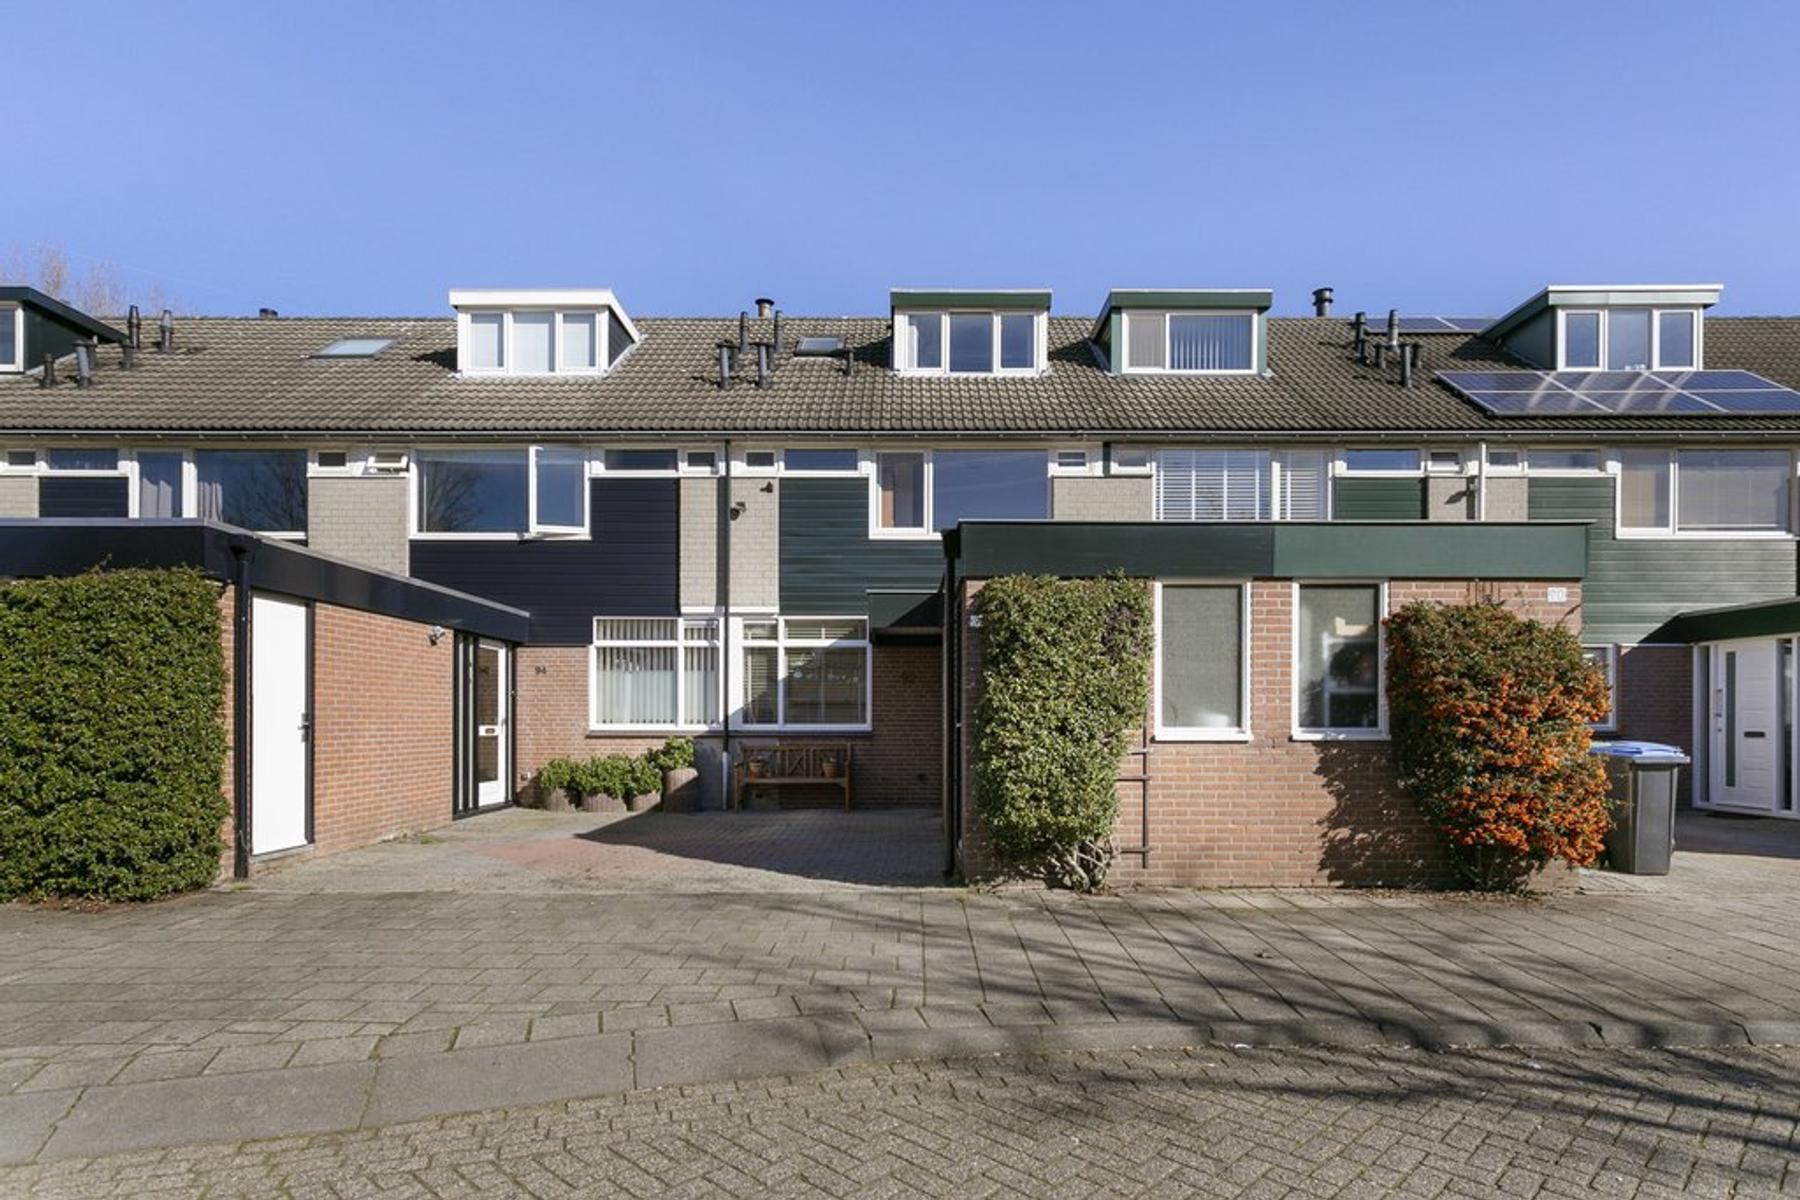 Lieshoutstraat 92 in Arnhem 6844 EC